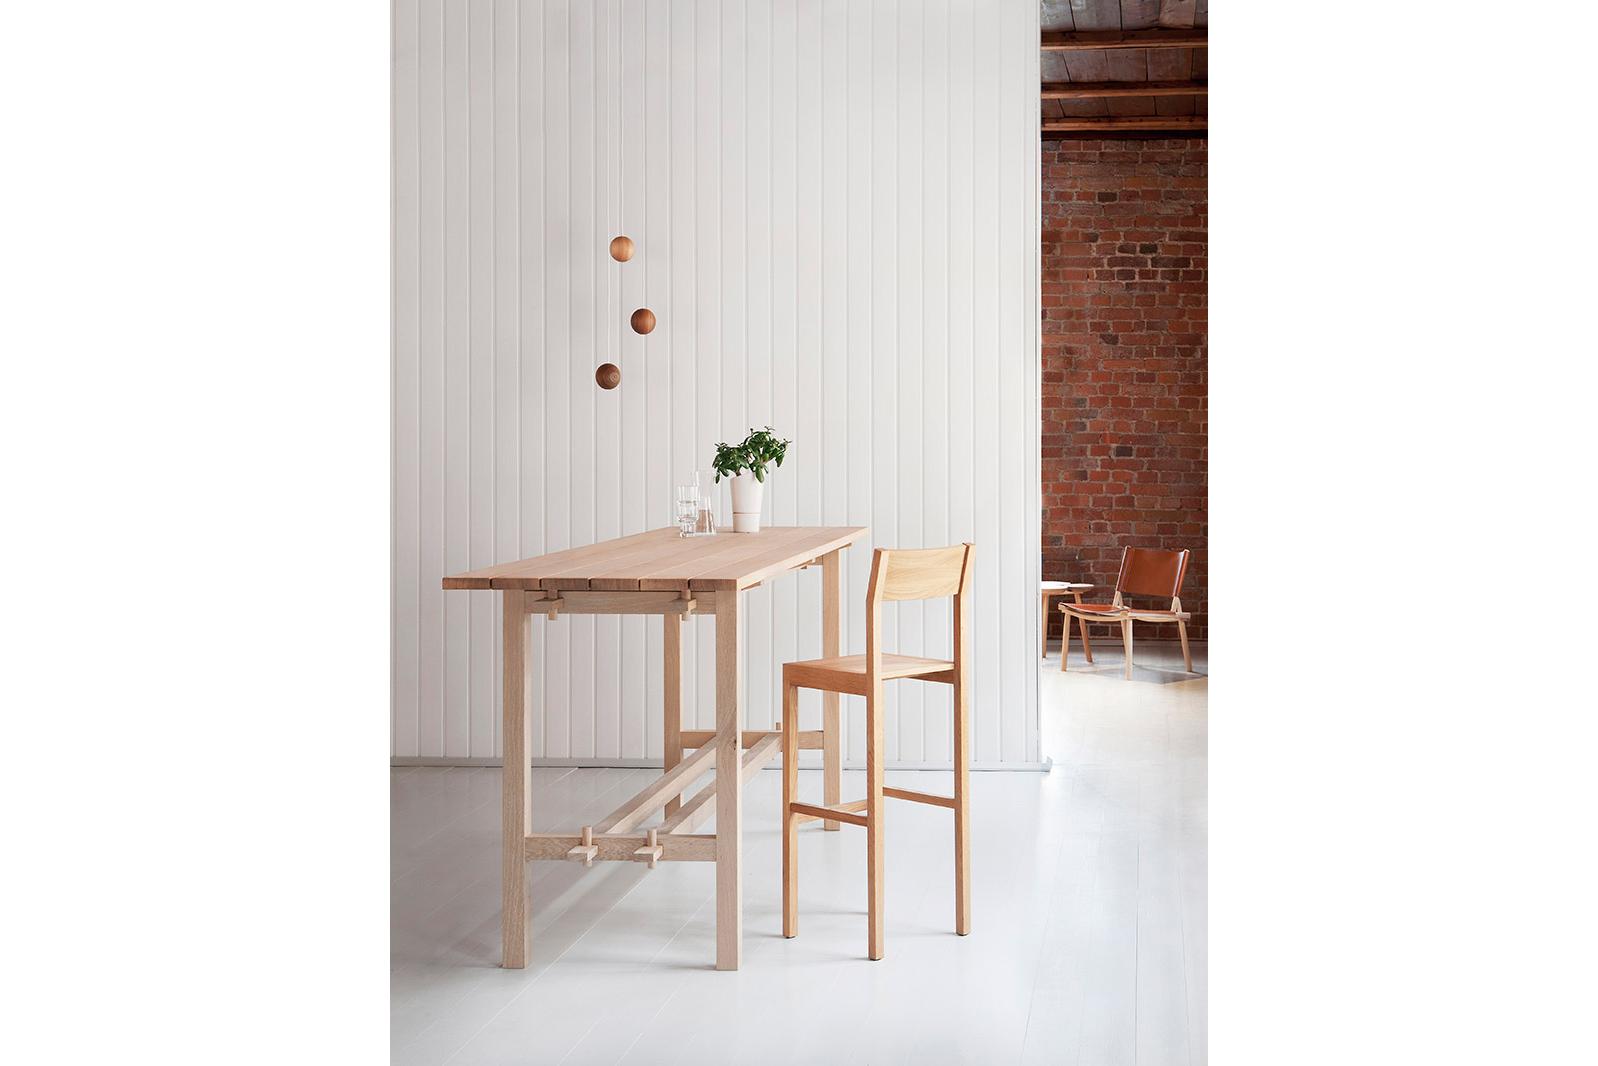 nikari-stockholm-furniture-fair-2018-designboom-001.jpg